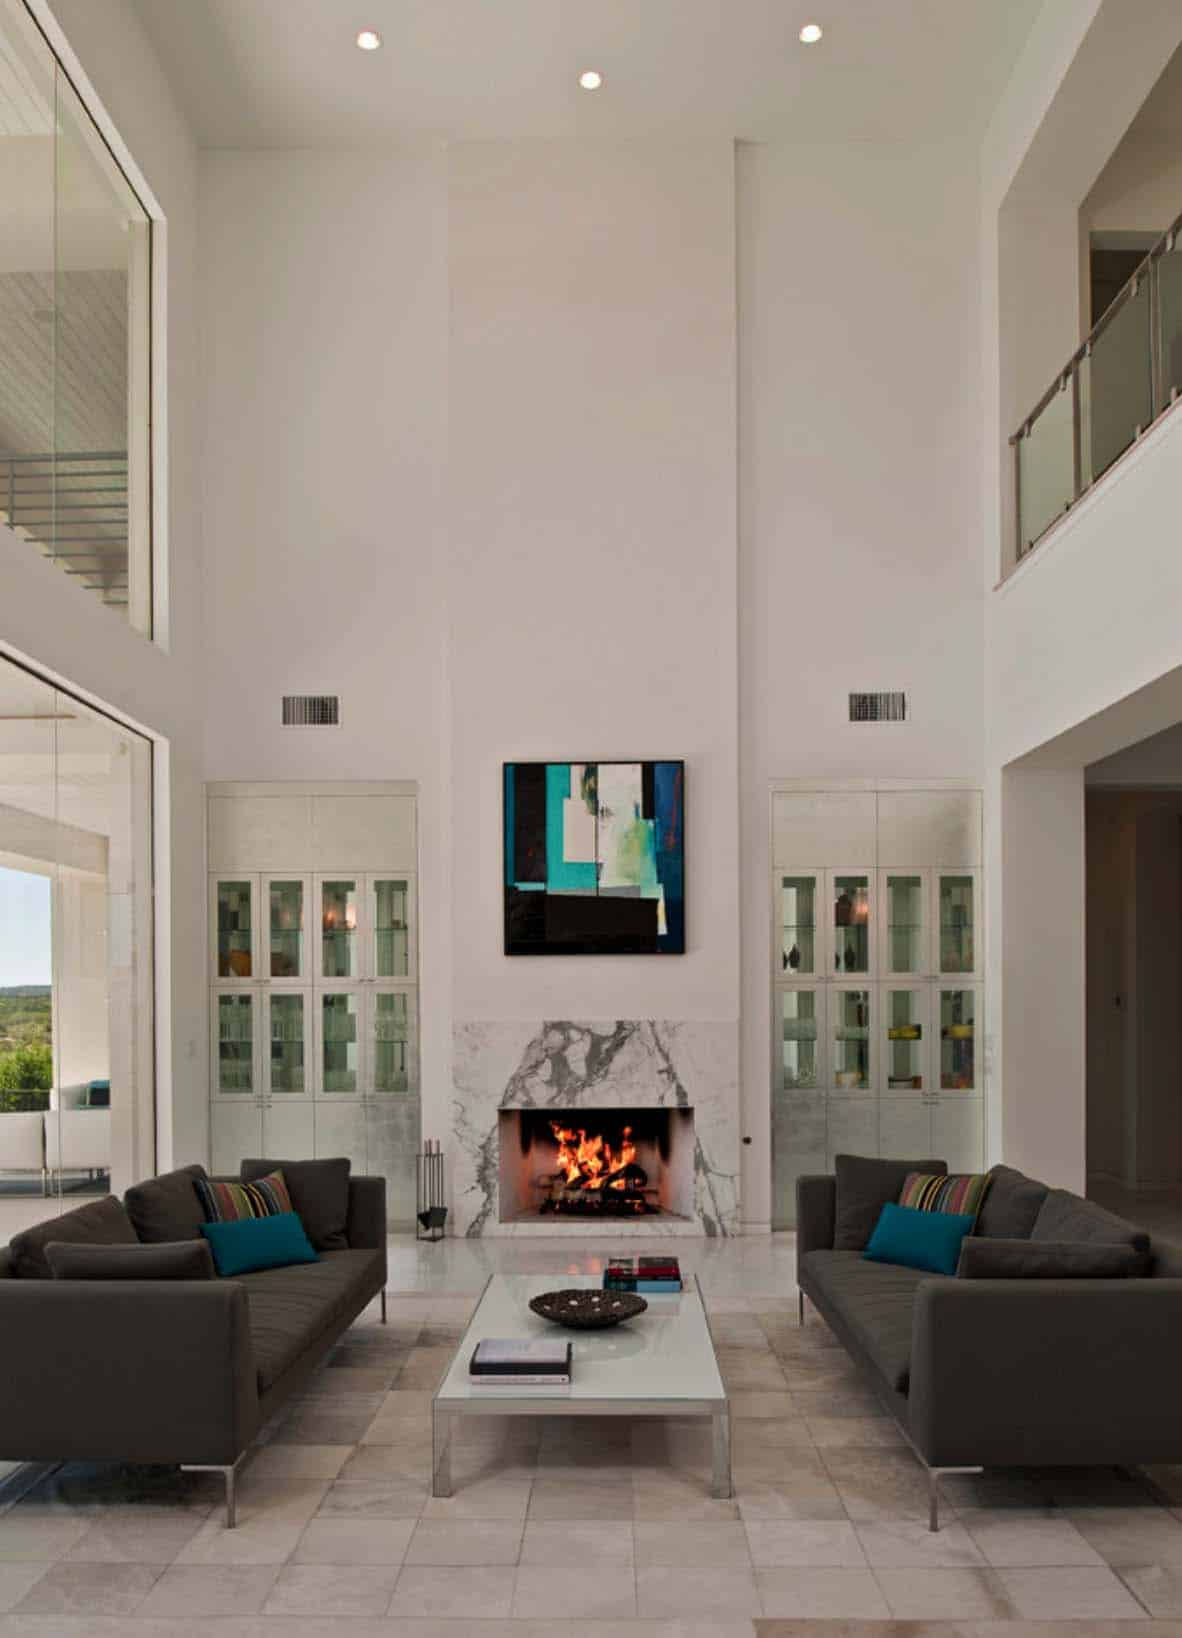 Coastal Contemporary Home In Austin Showcases Fascinating